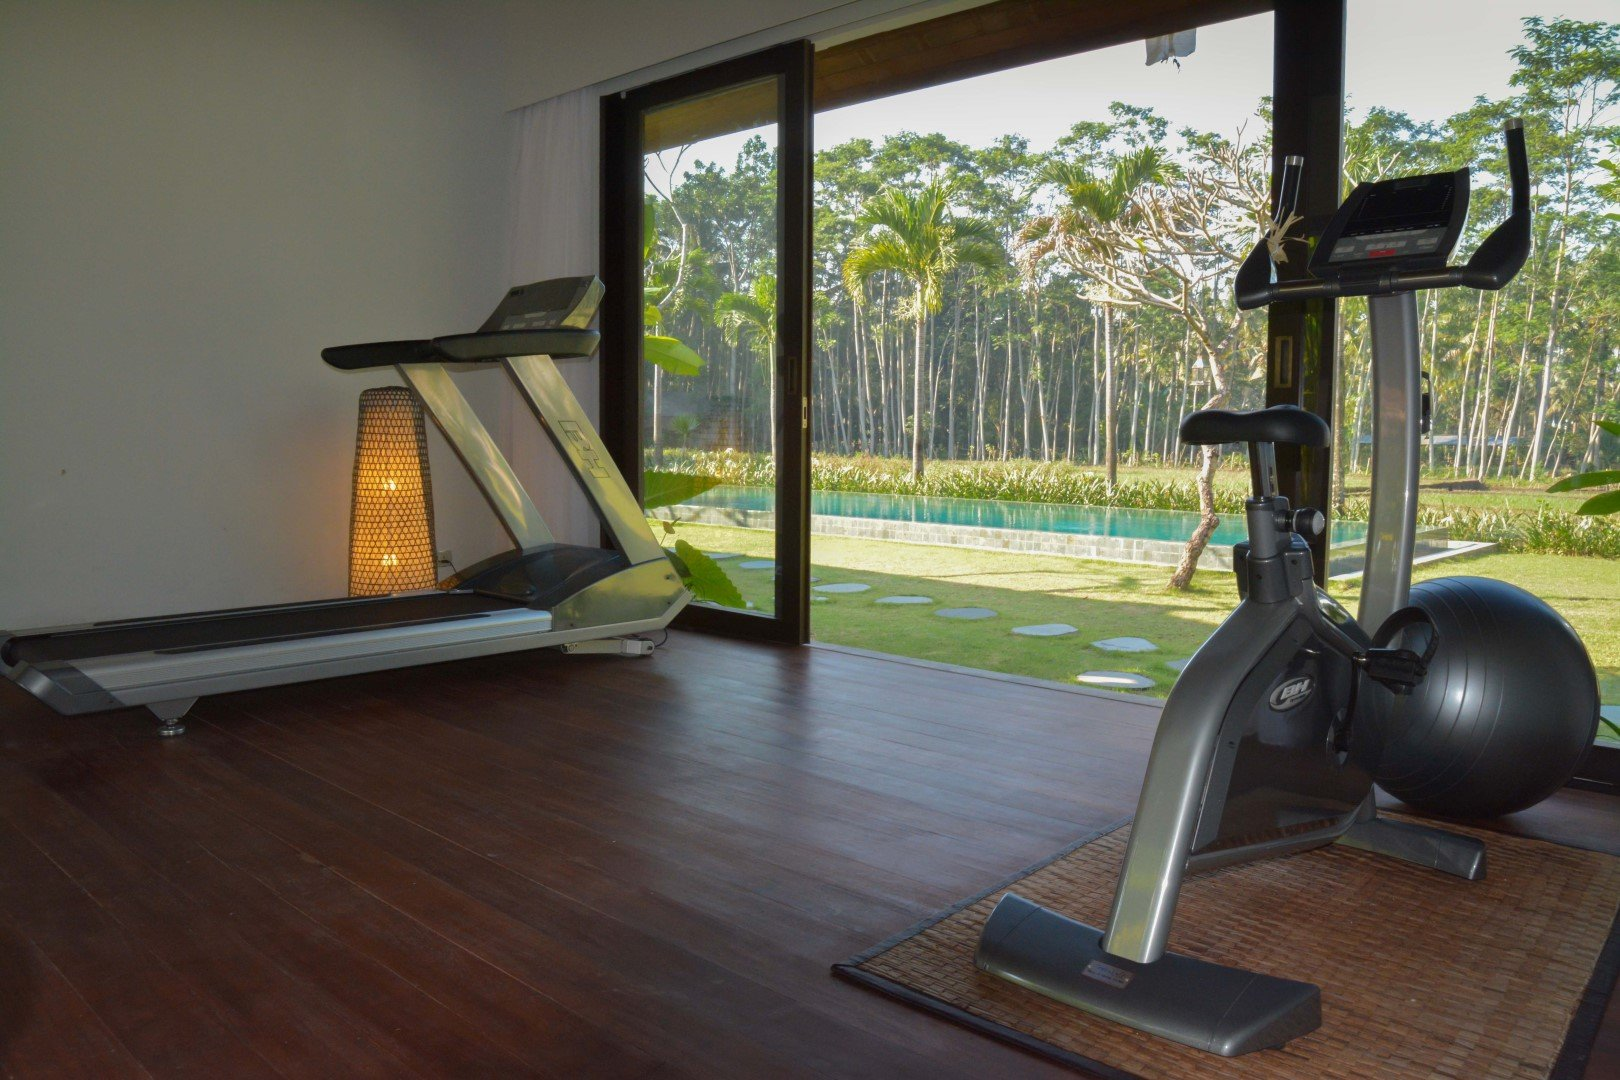 Villa Lumia - Fully Equipped Fitness Center